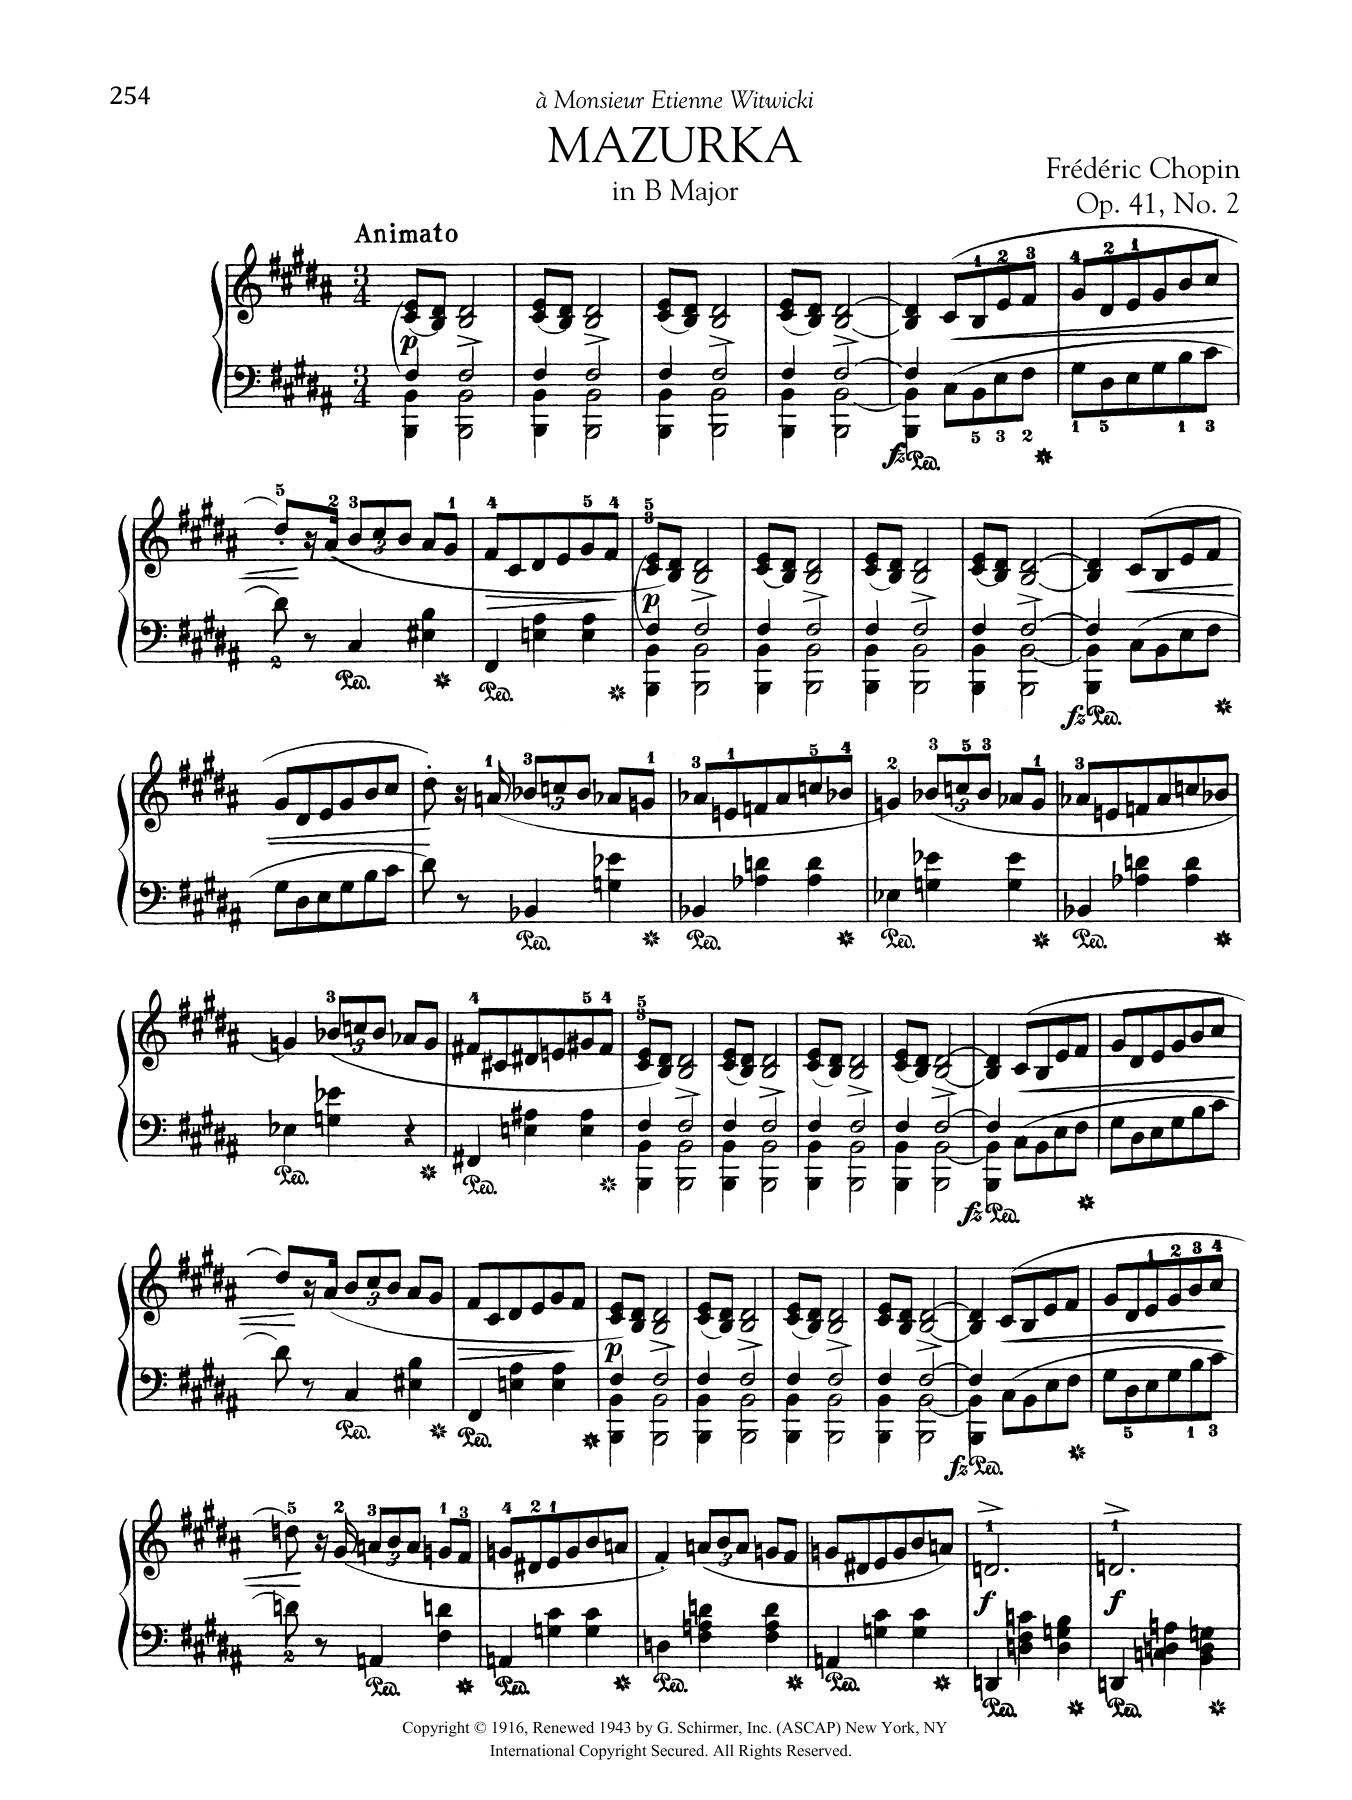 Mazurka in B Major, Op. 41, No. 2 Sheet Music